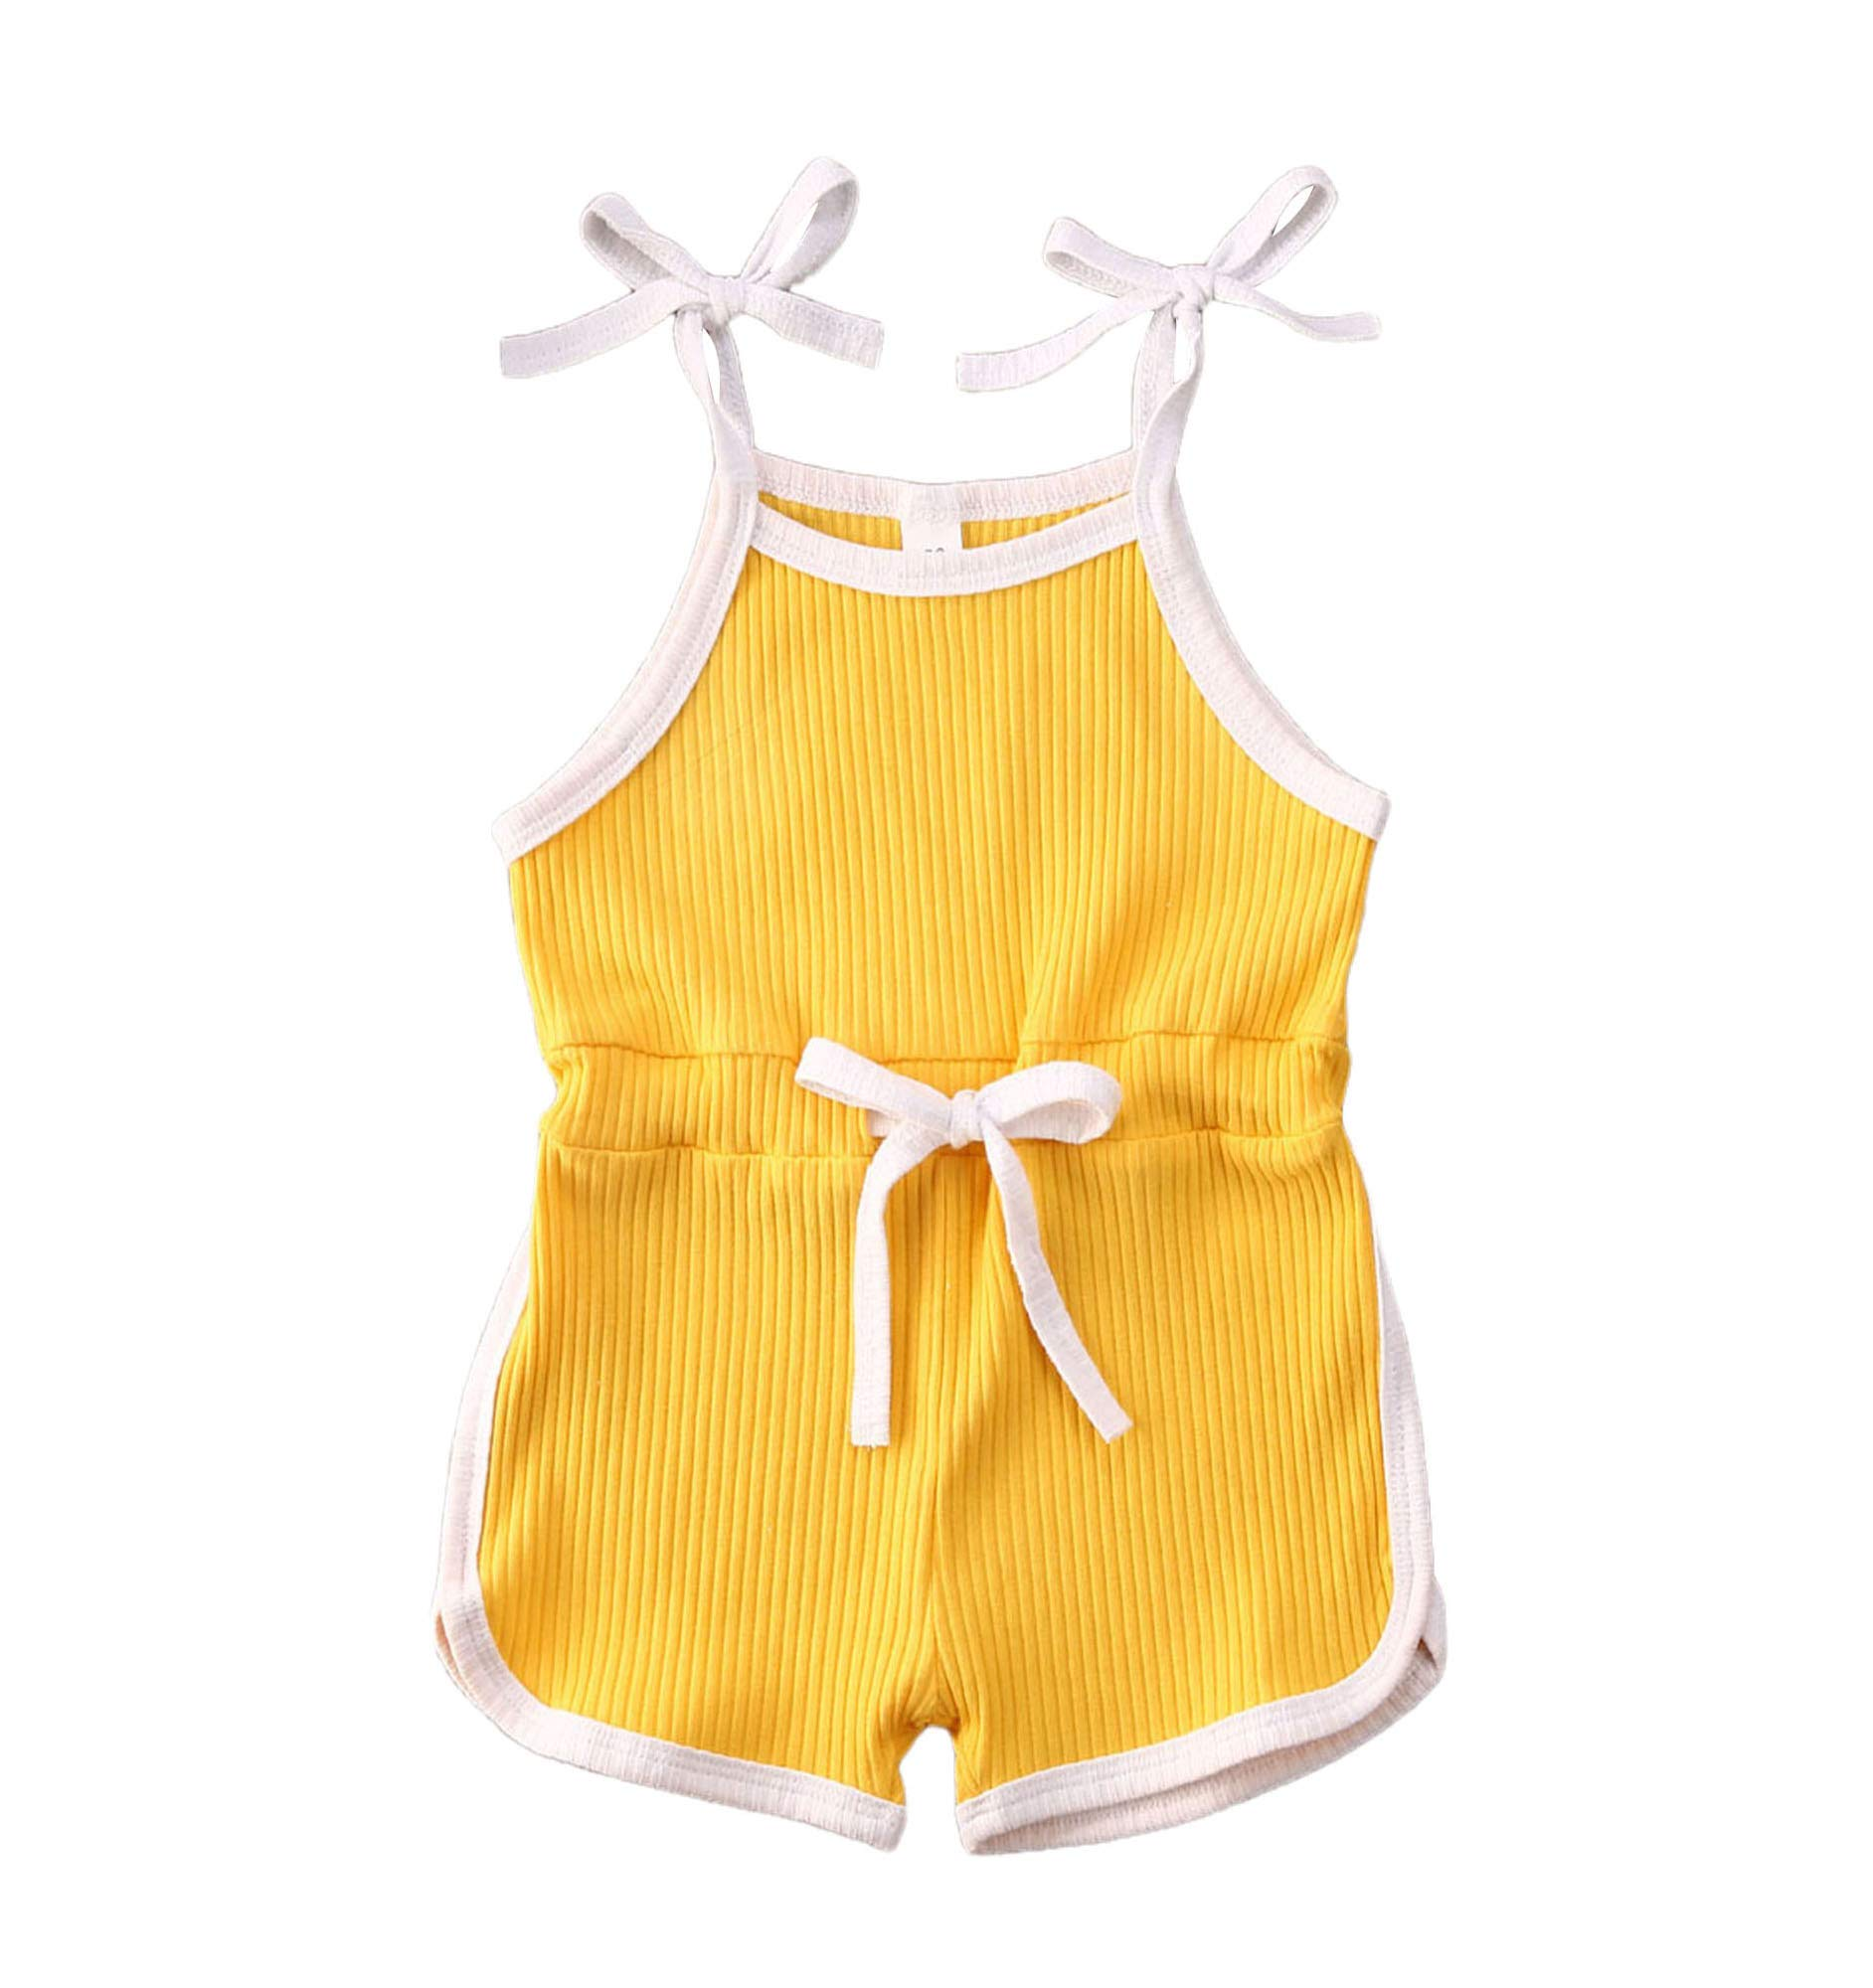 allshope Baby Girls Strap Romper Summer Bodysuit Jumpsuit Cute Toddler Overalls Outfits